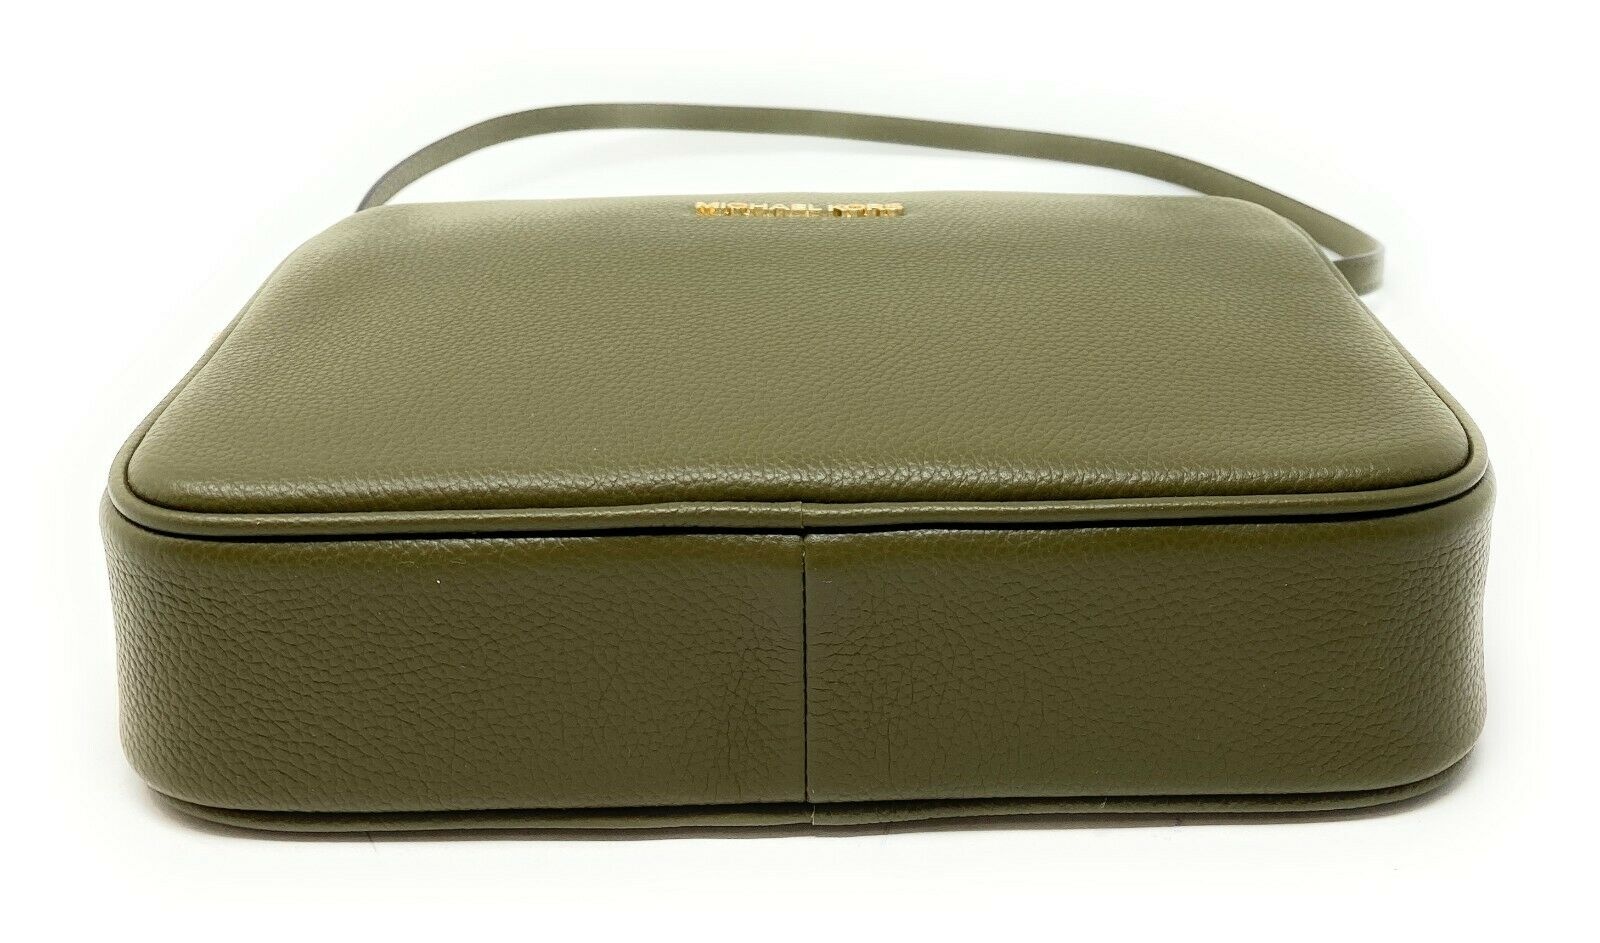 thumbnail 48 - Michael Kors Jet Set Item Large East West Crossbody Chain Handbag Clutch $298